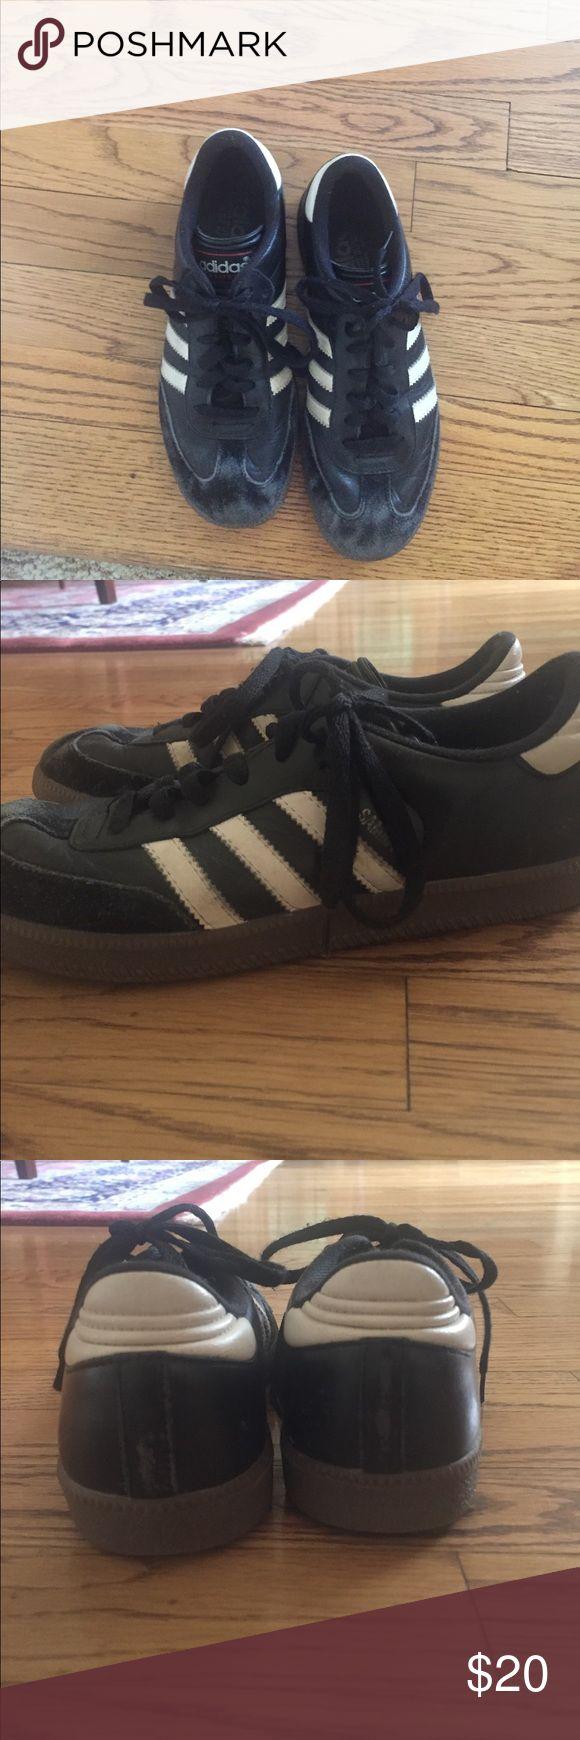 Black adidas sambas Used! No holes! adidas Shoes Sneakers